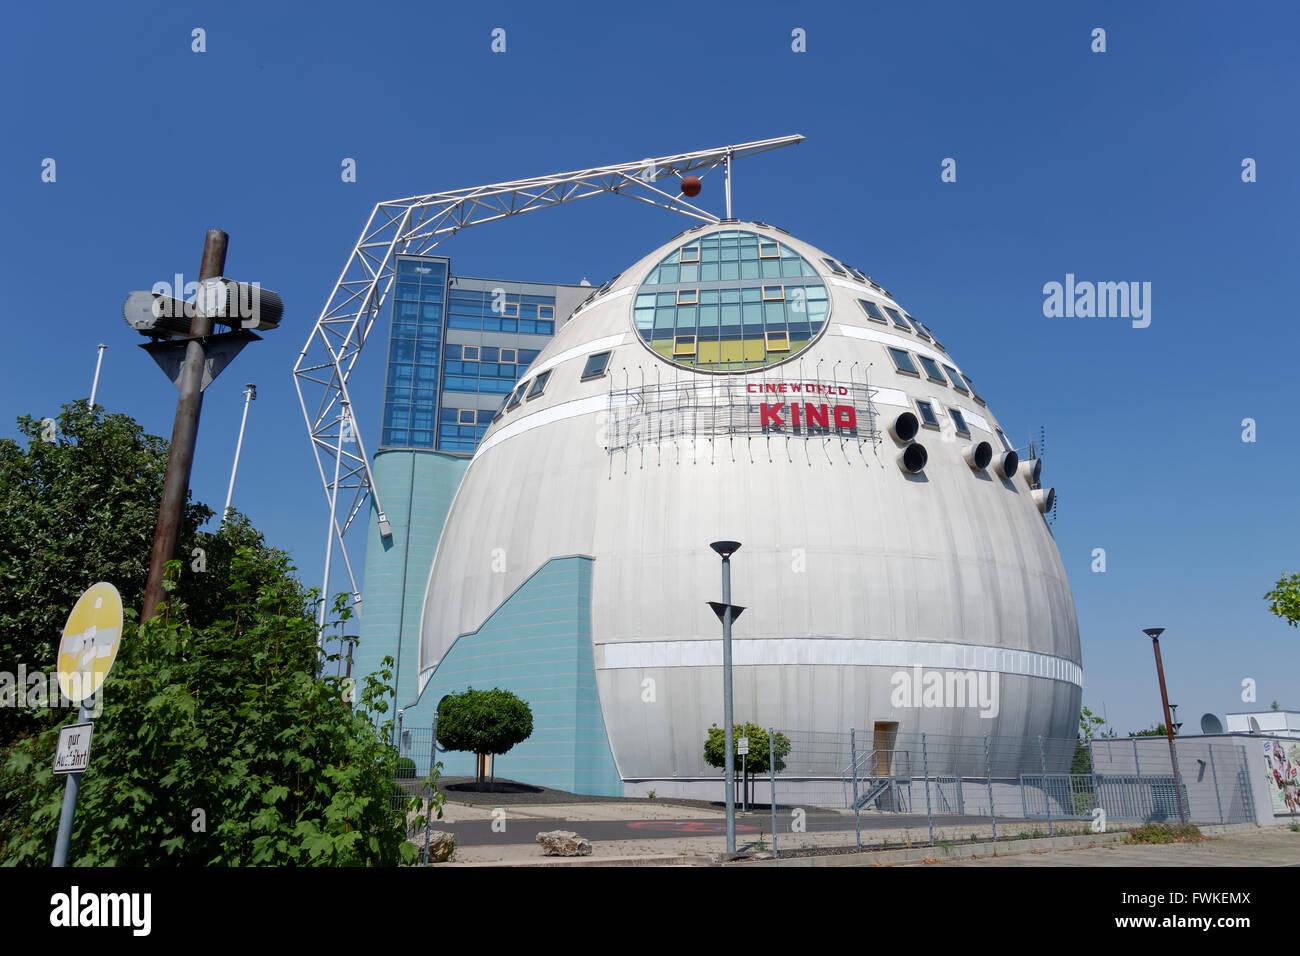 Kino Mainfrankenpark